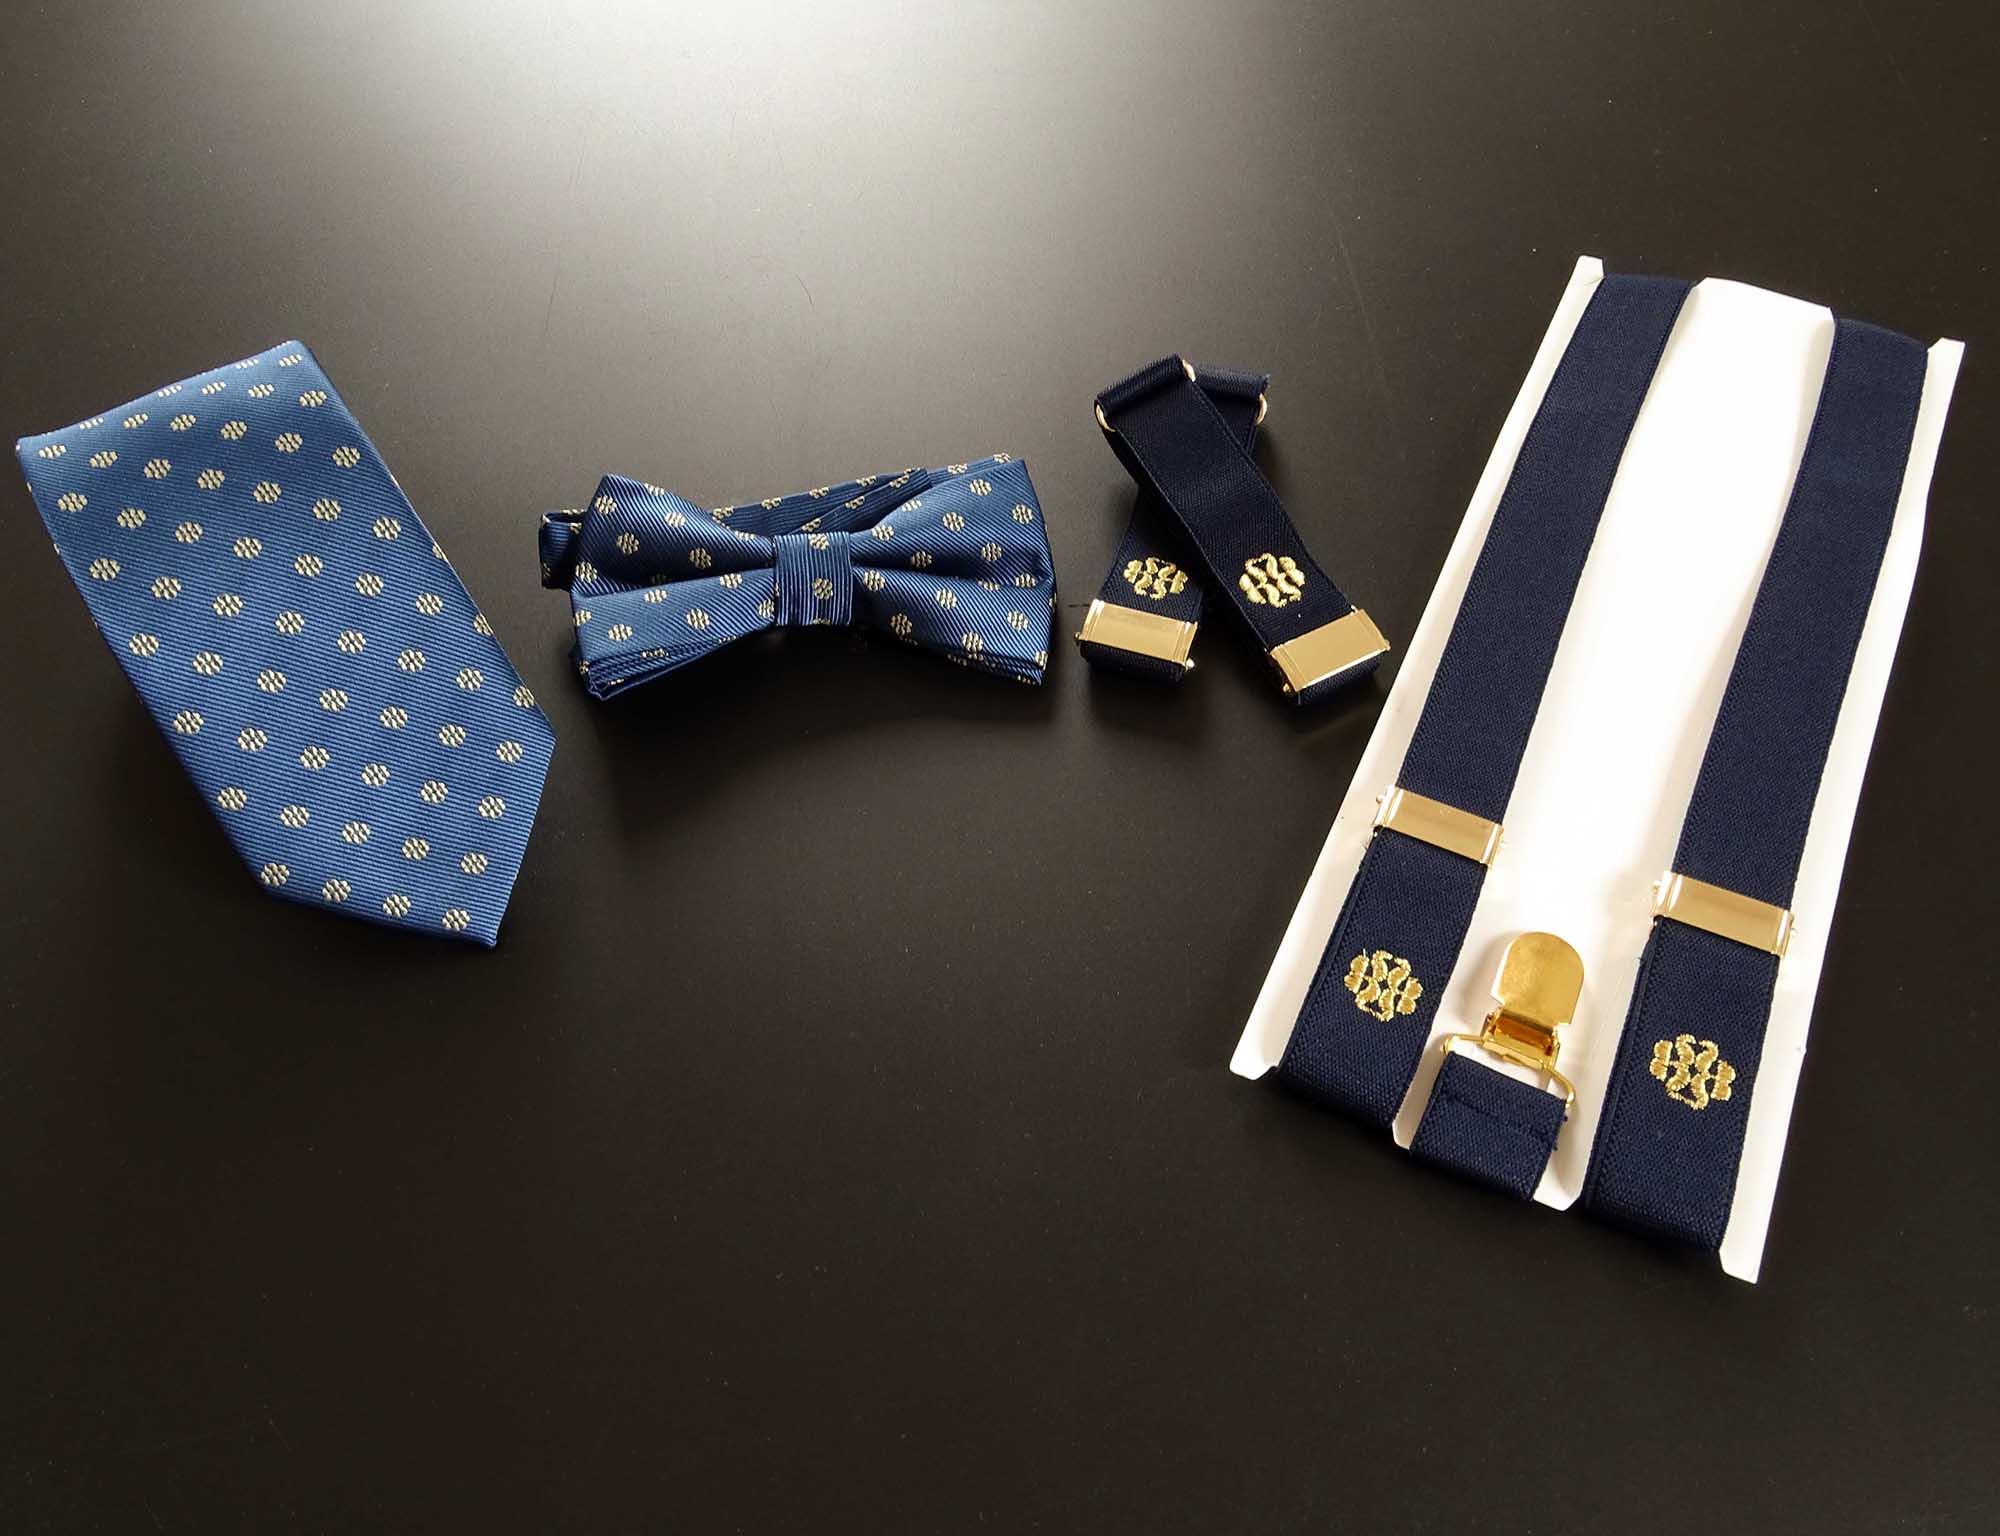 Royal Bliss, Fliege, Krawatte, Hemdenhalter und Hosenträger nach Maß